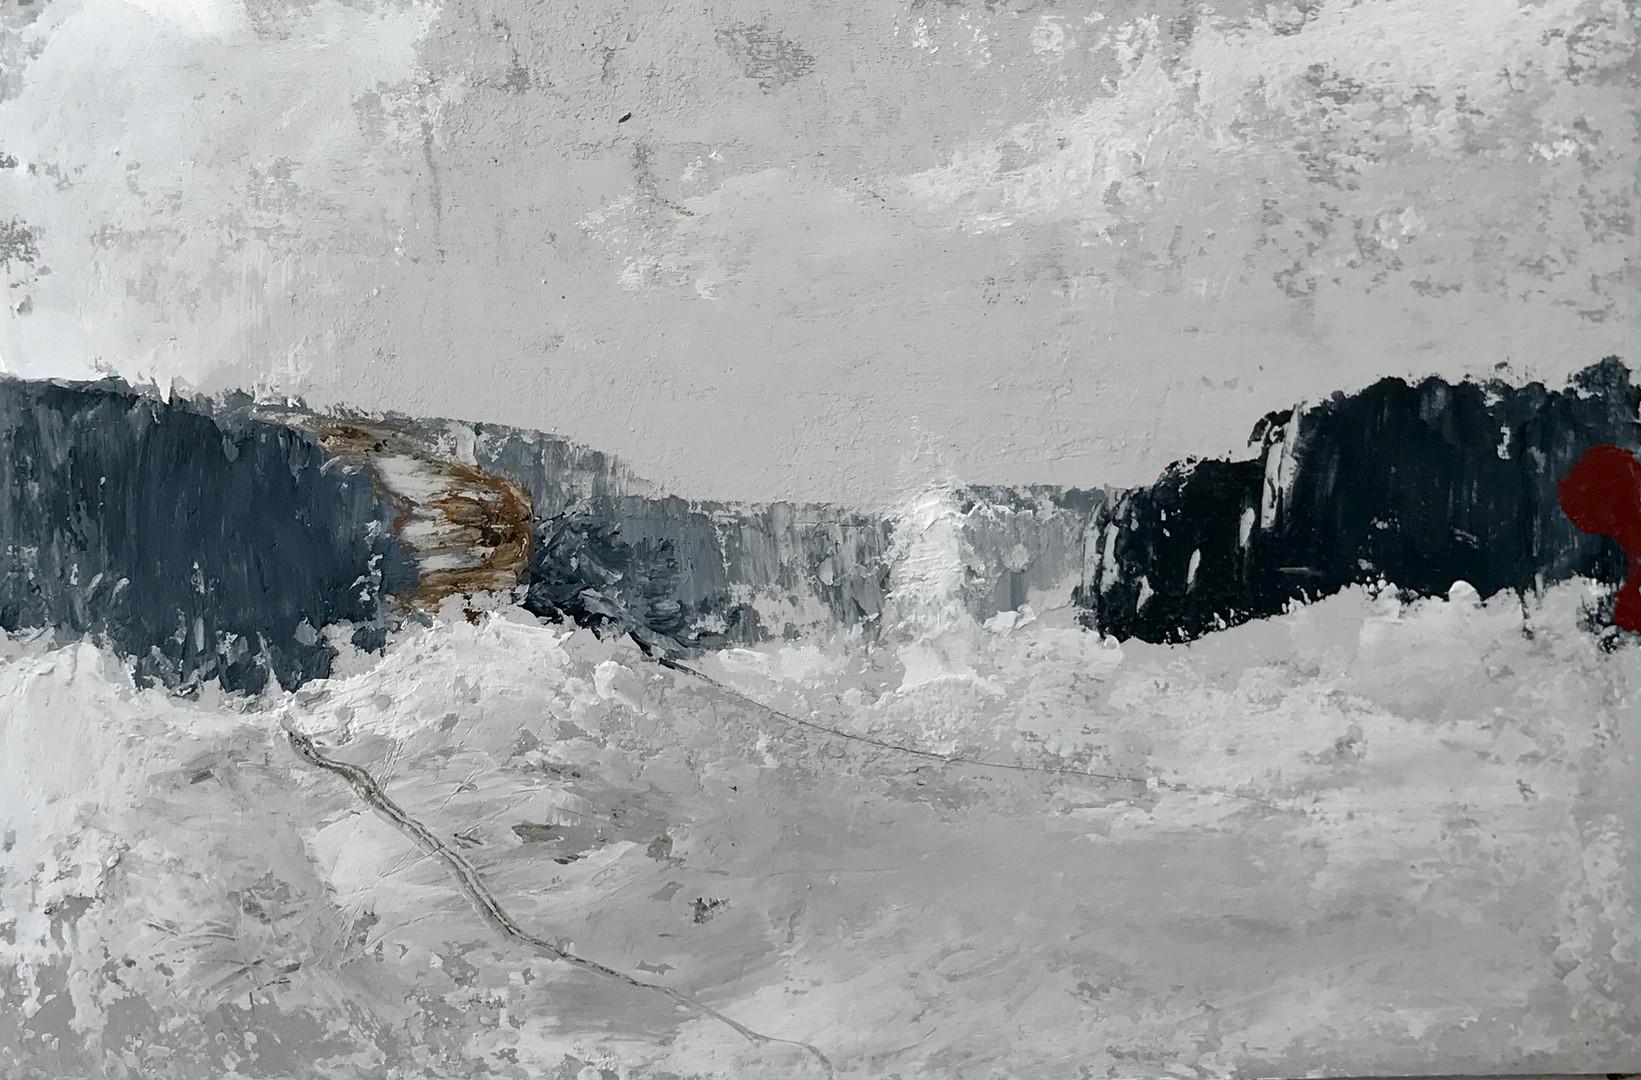 Nieve. 19,8 x 30 cm. Acrilico+coldwax